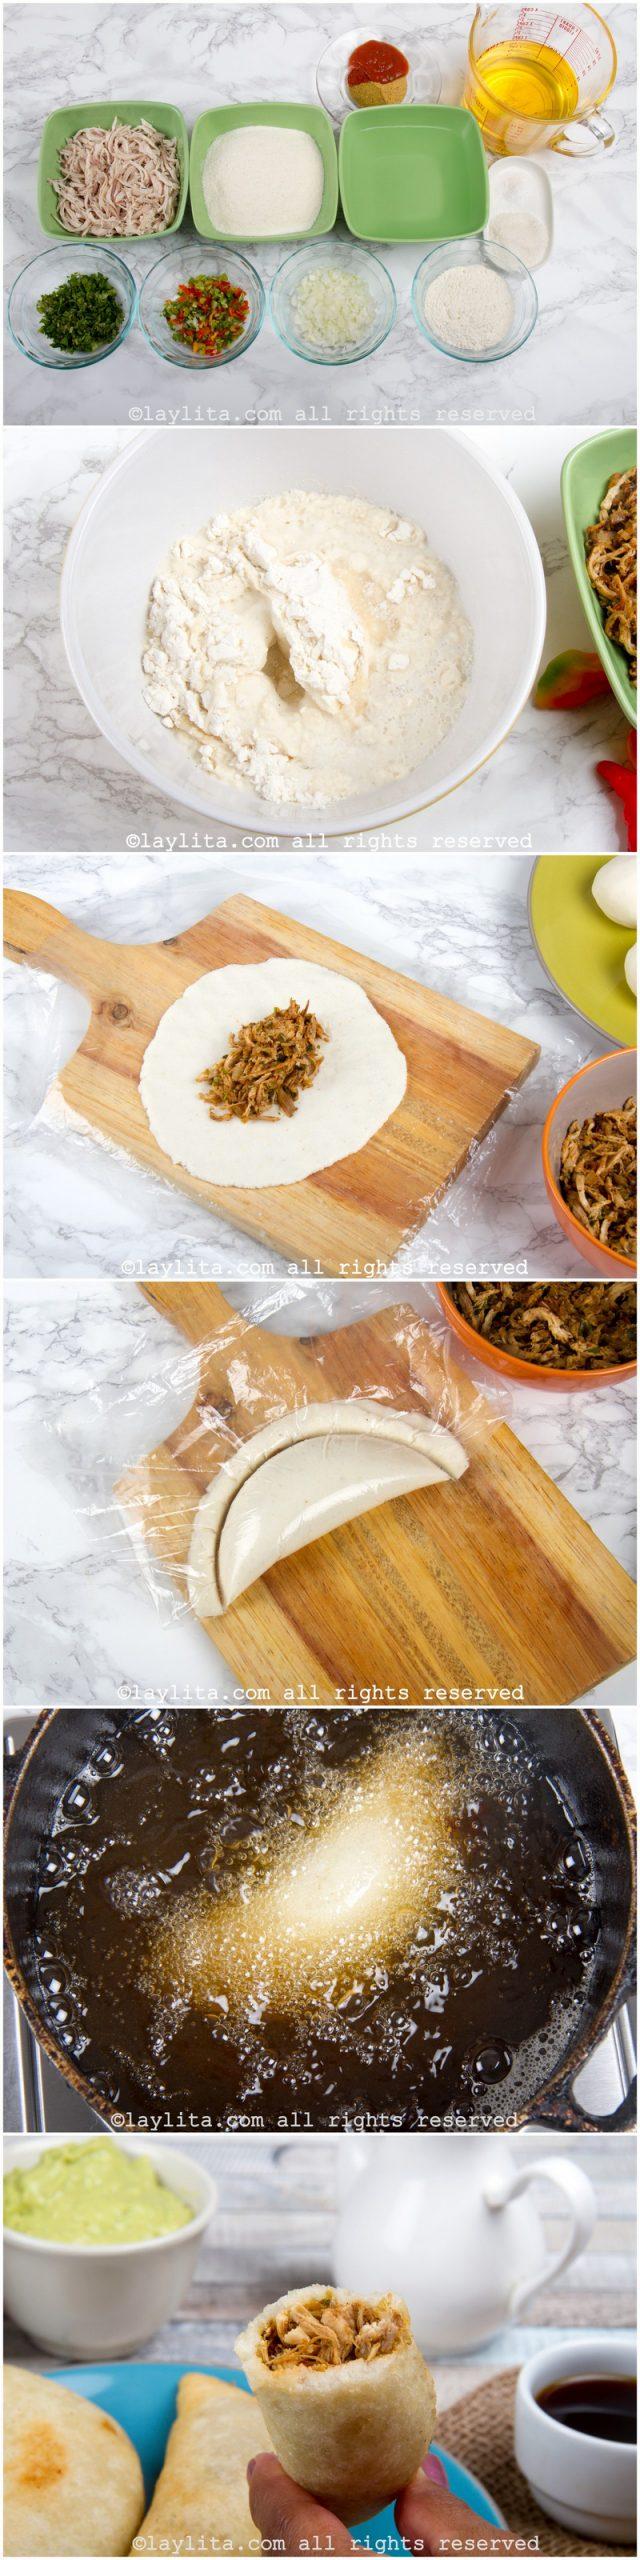 Como hacer empanadas venezolanas